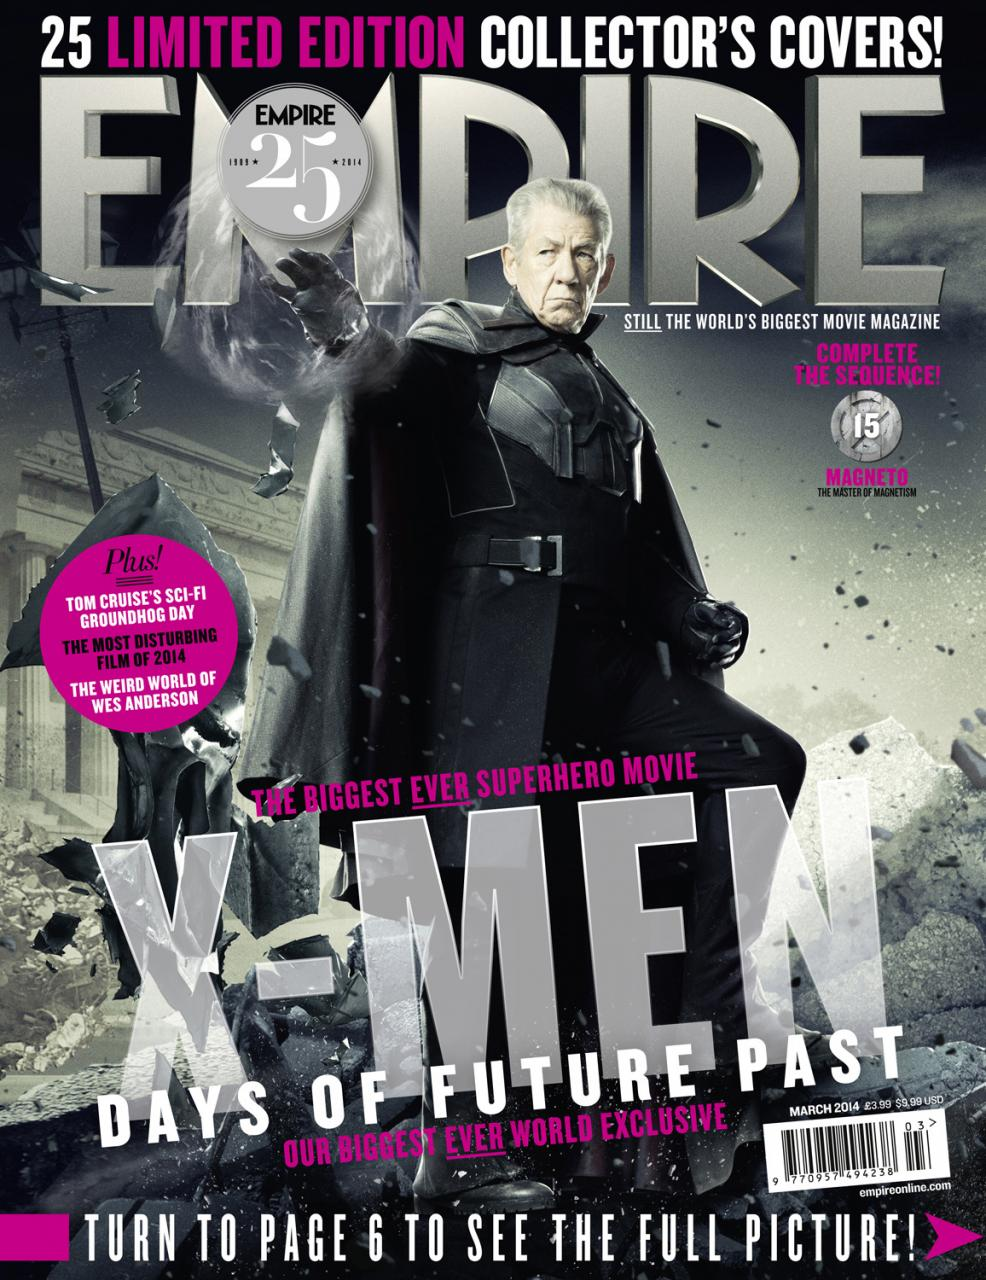 X-MEN DAYS OF FUTURE PAST Empire Magazine Covers  (8)